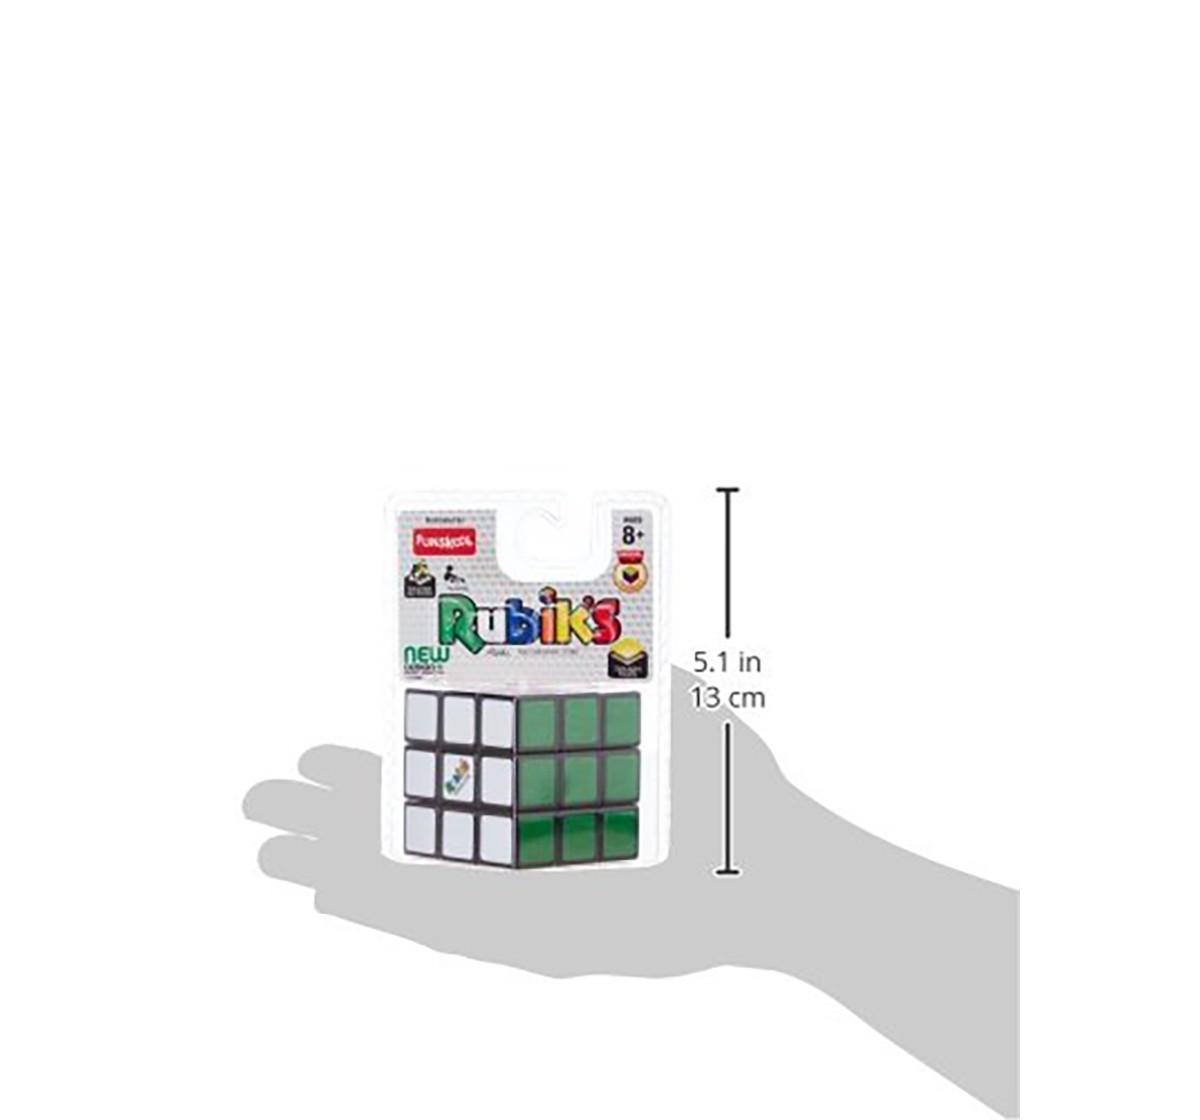 Rubiks Funskool-Rubik'S Cube Games for Kids age 8Y+